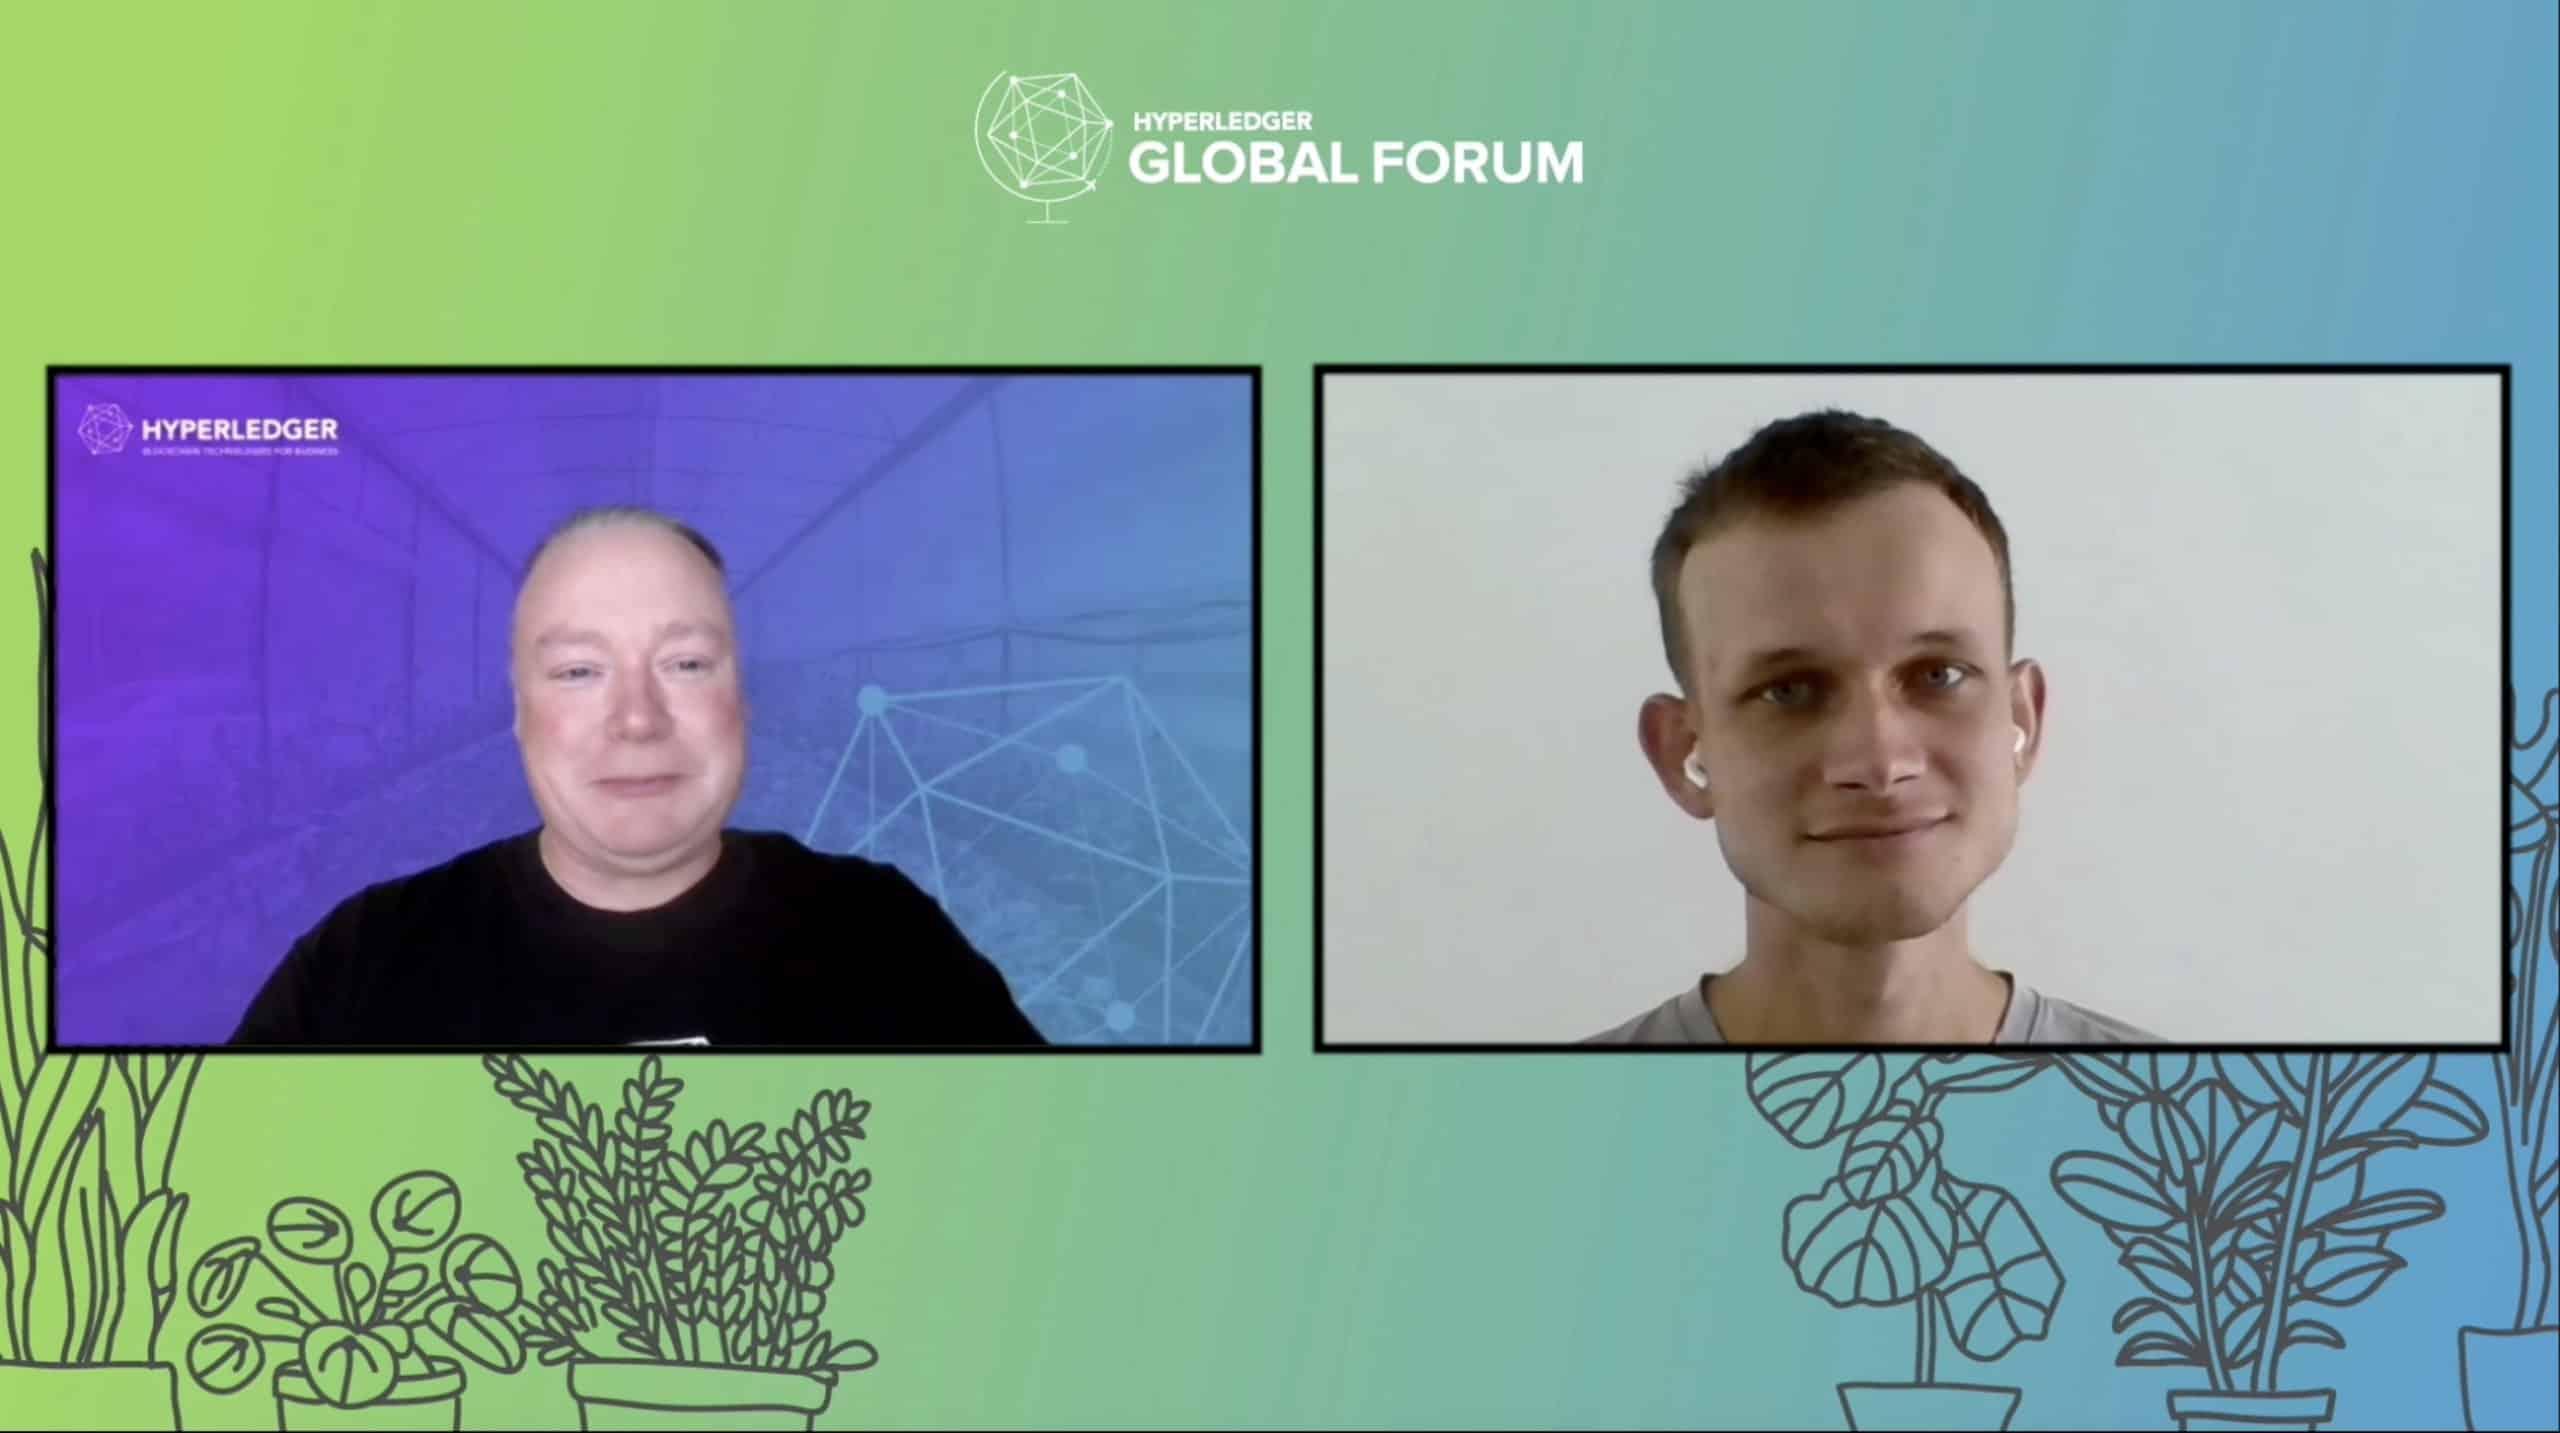 Vitalik Buterin: Why Eth2 will propel Ethereum's use in enterprise